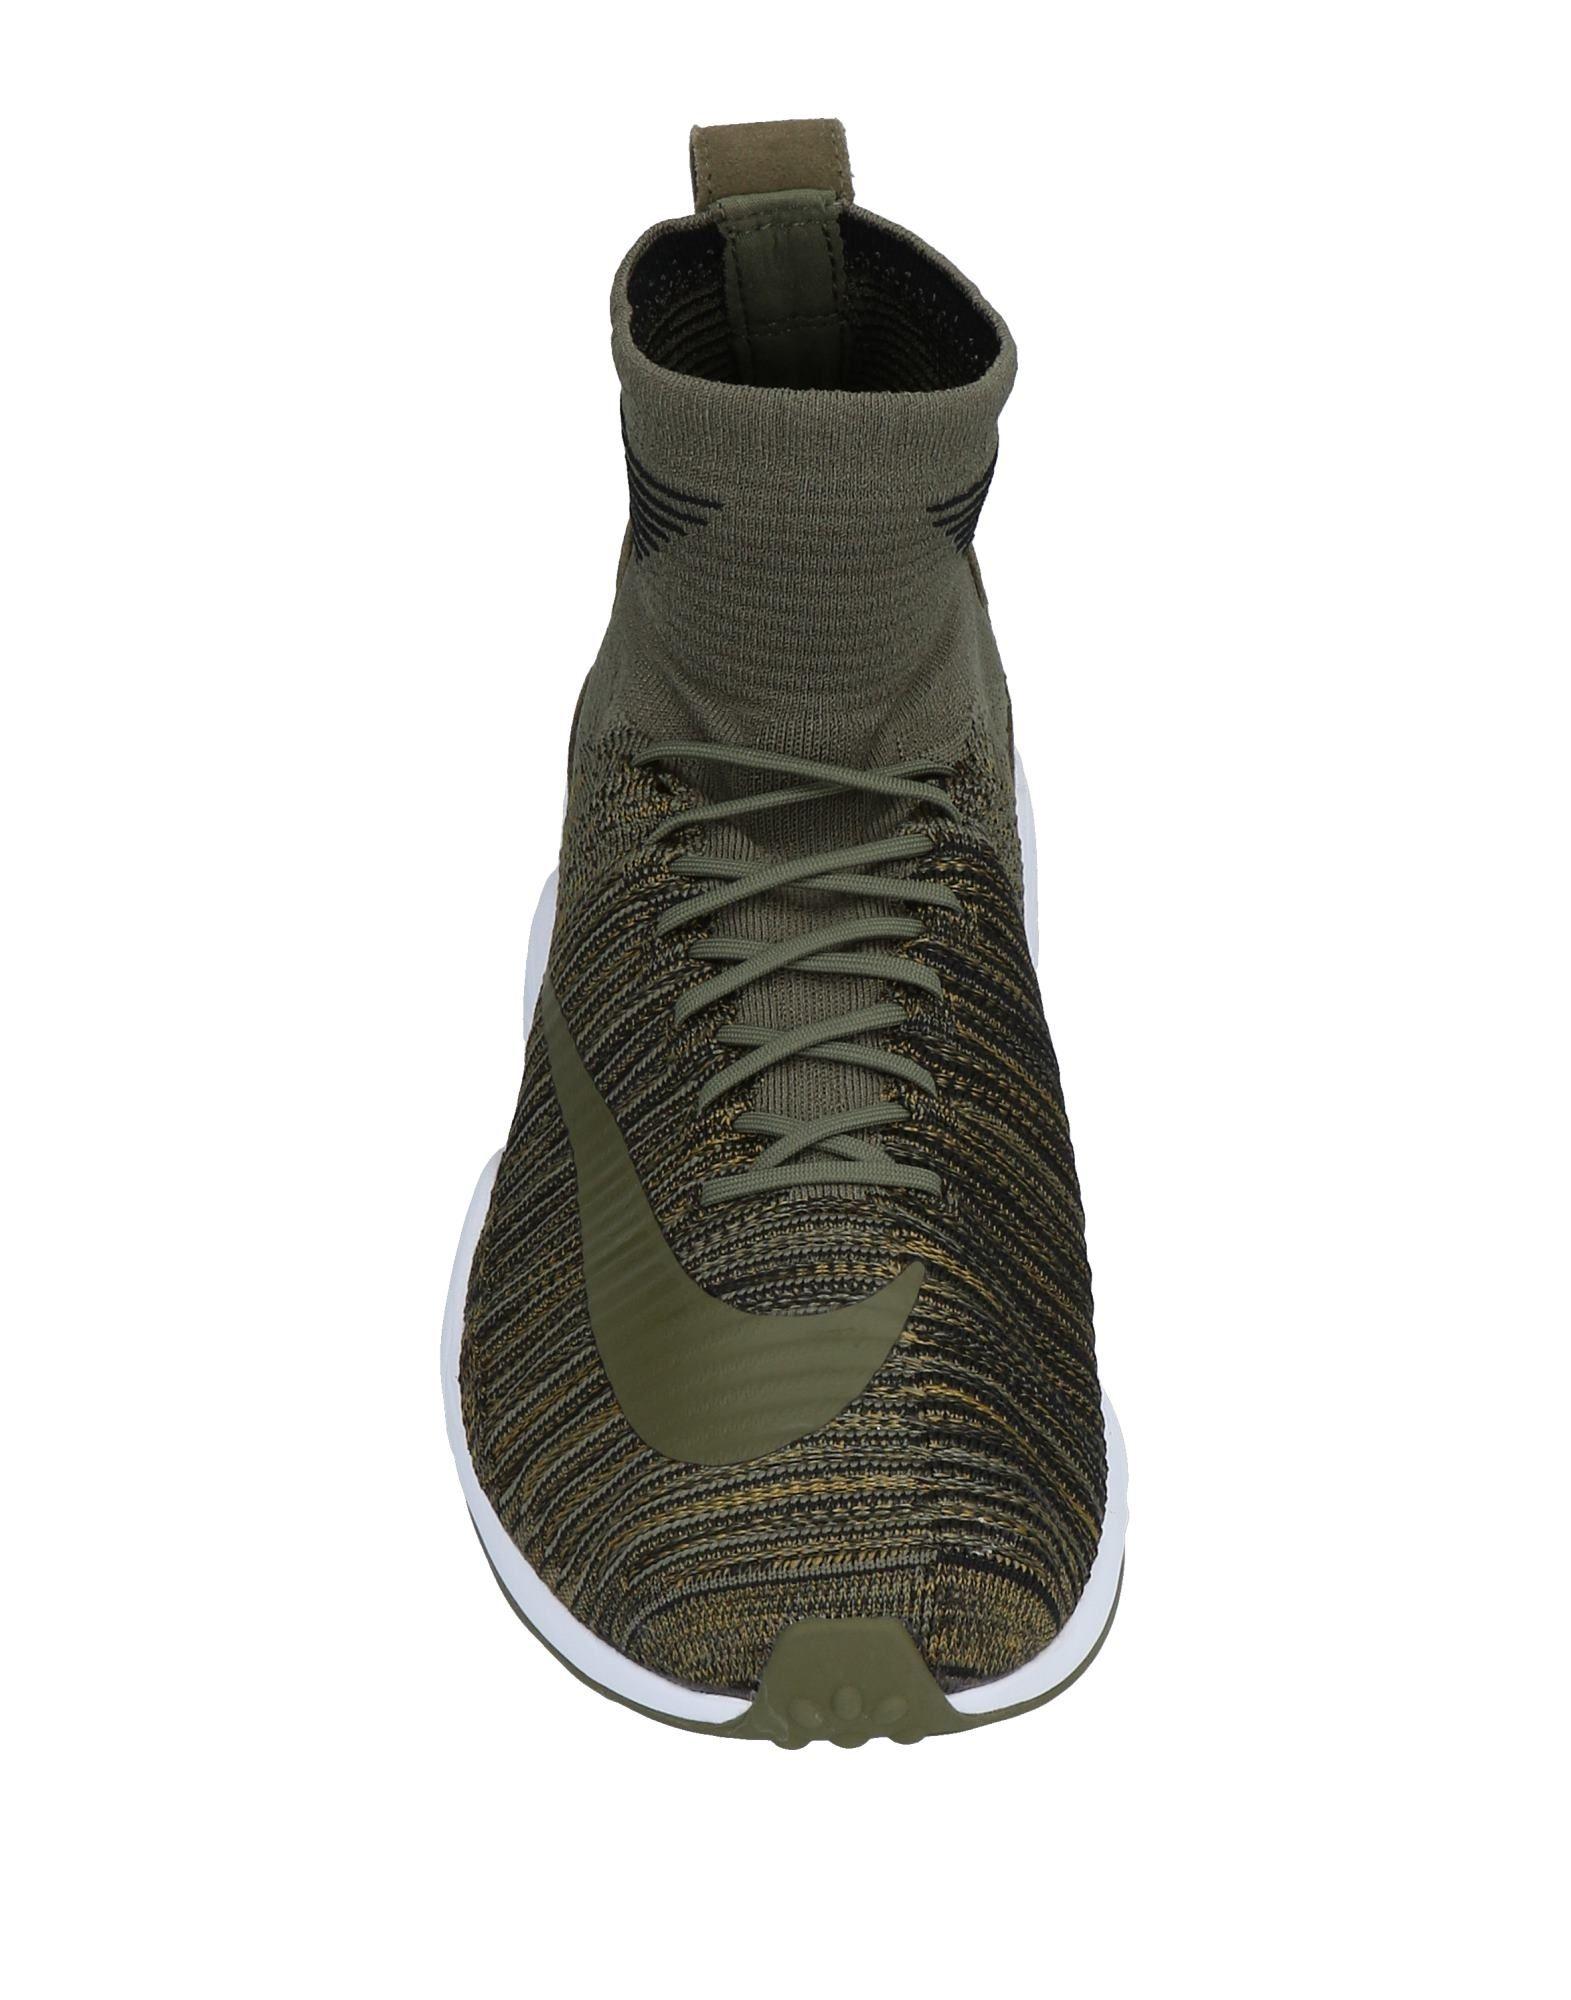 Herren Nike Sneakers Herren   11487148TA Heiße Schuhe 4ff548